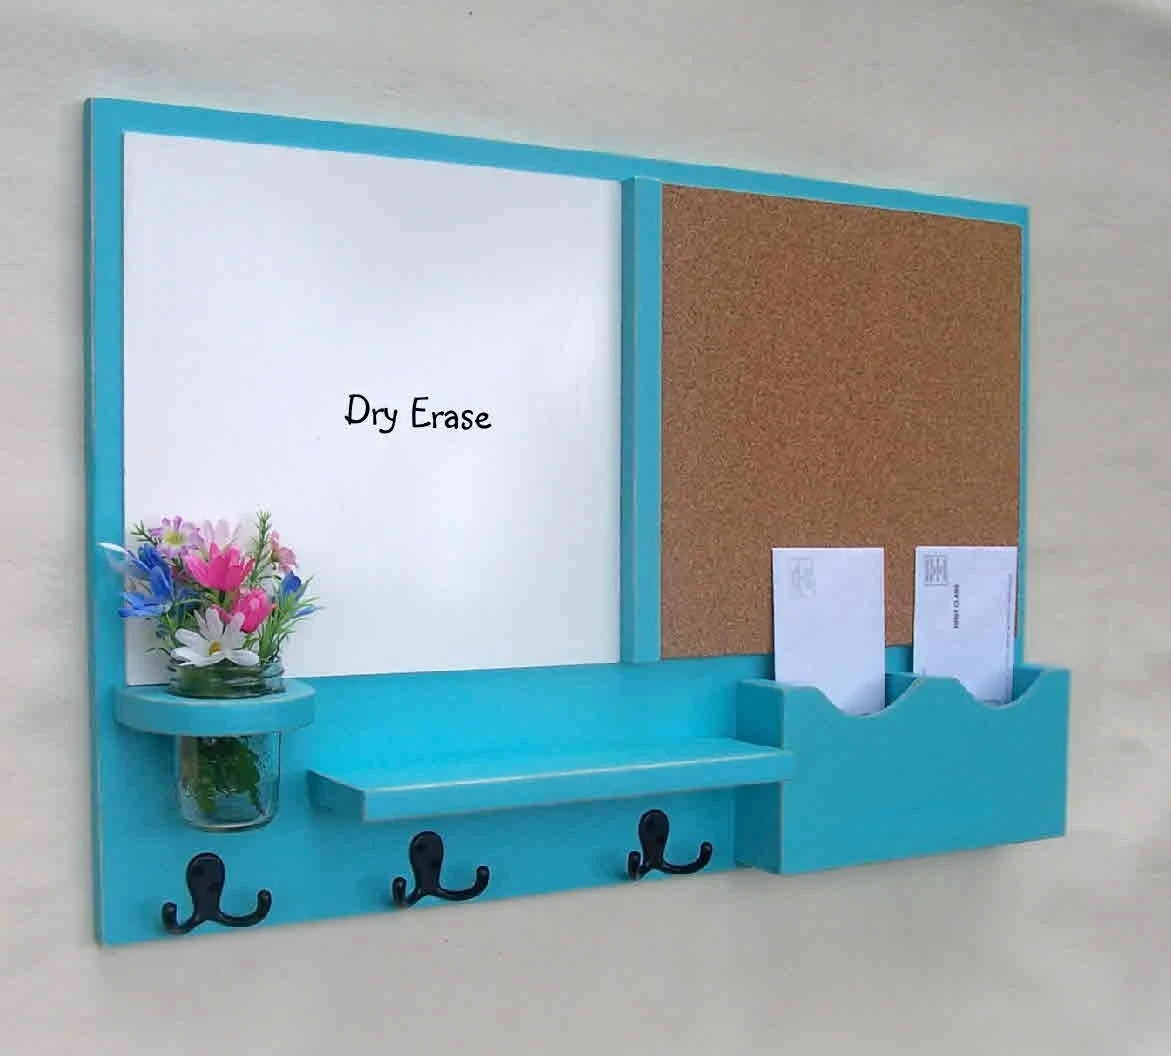 kitchen whiteboard sinks & faucets mail organizer message center cork board white by legacystudio